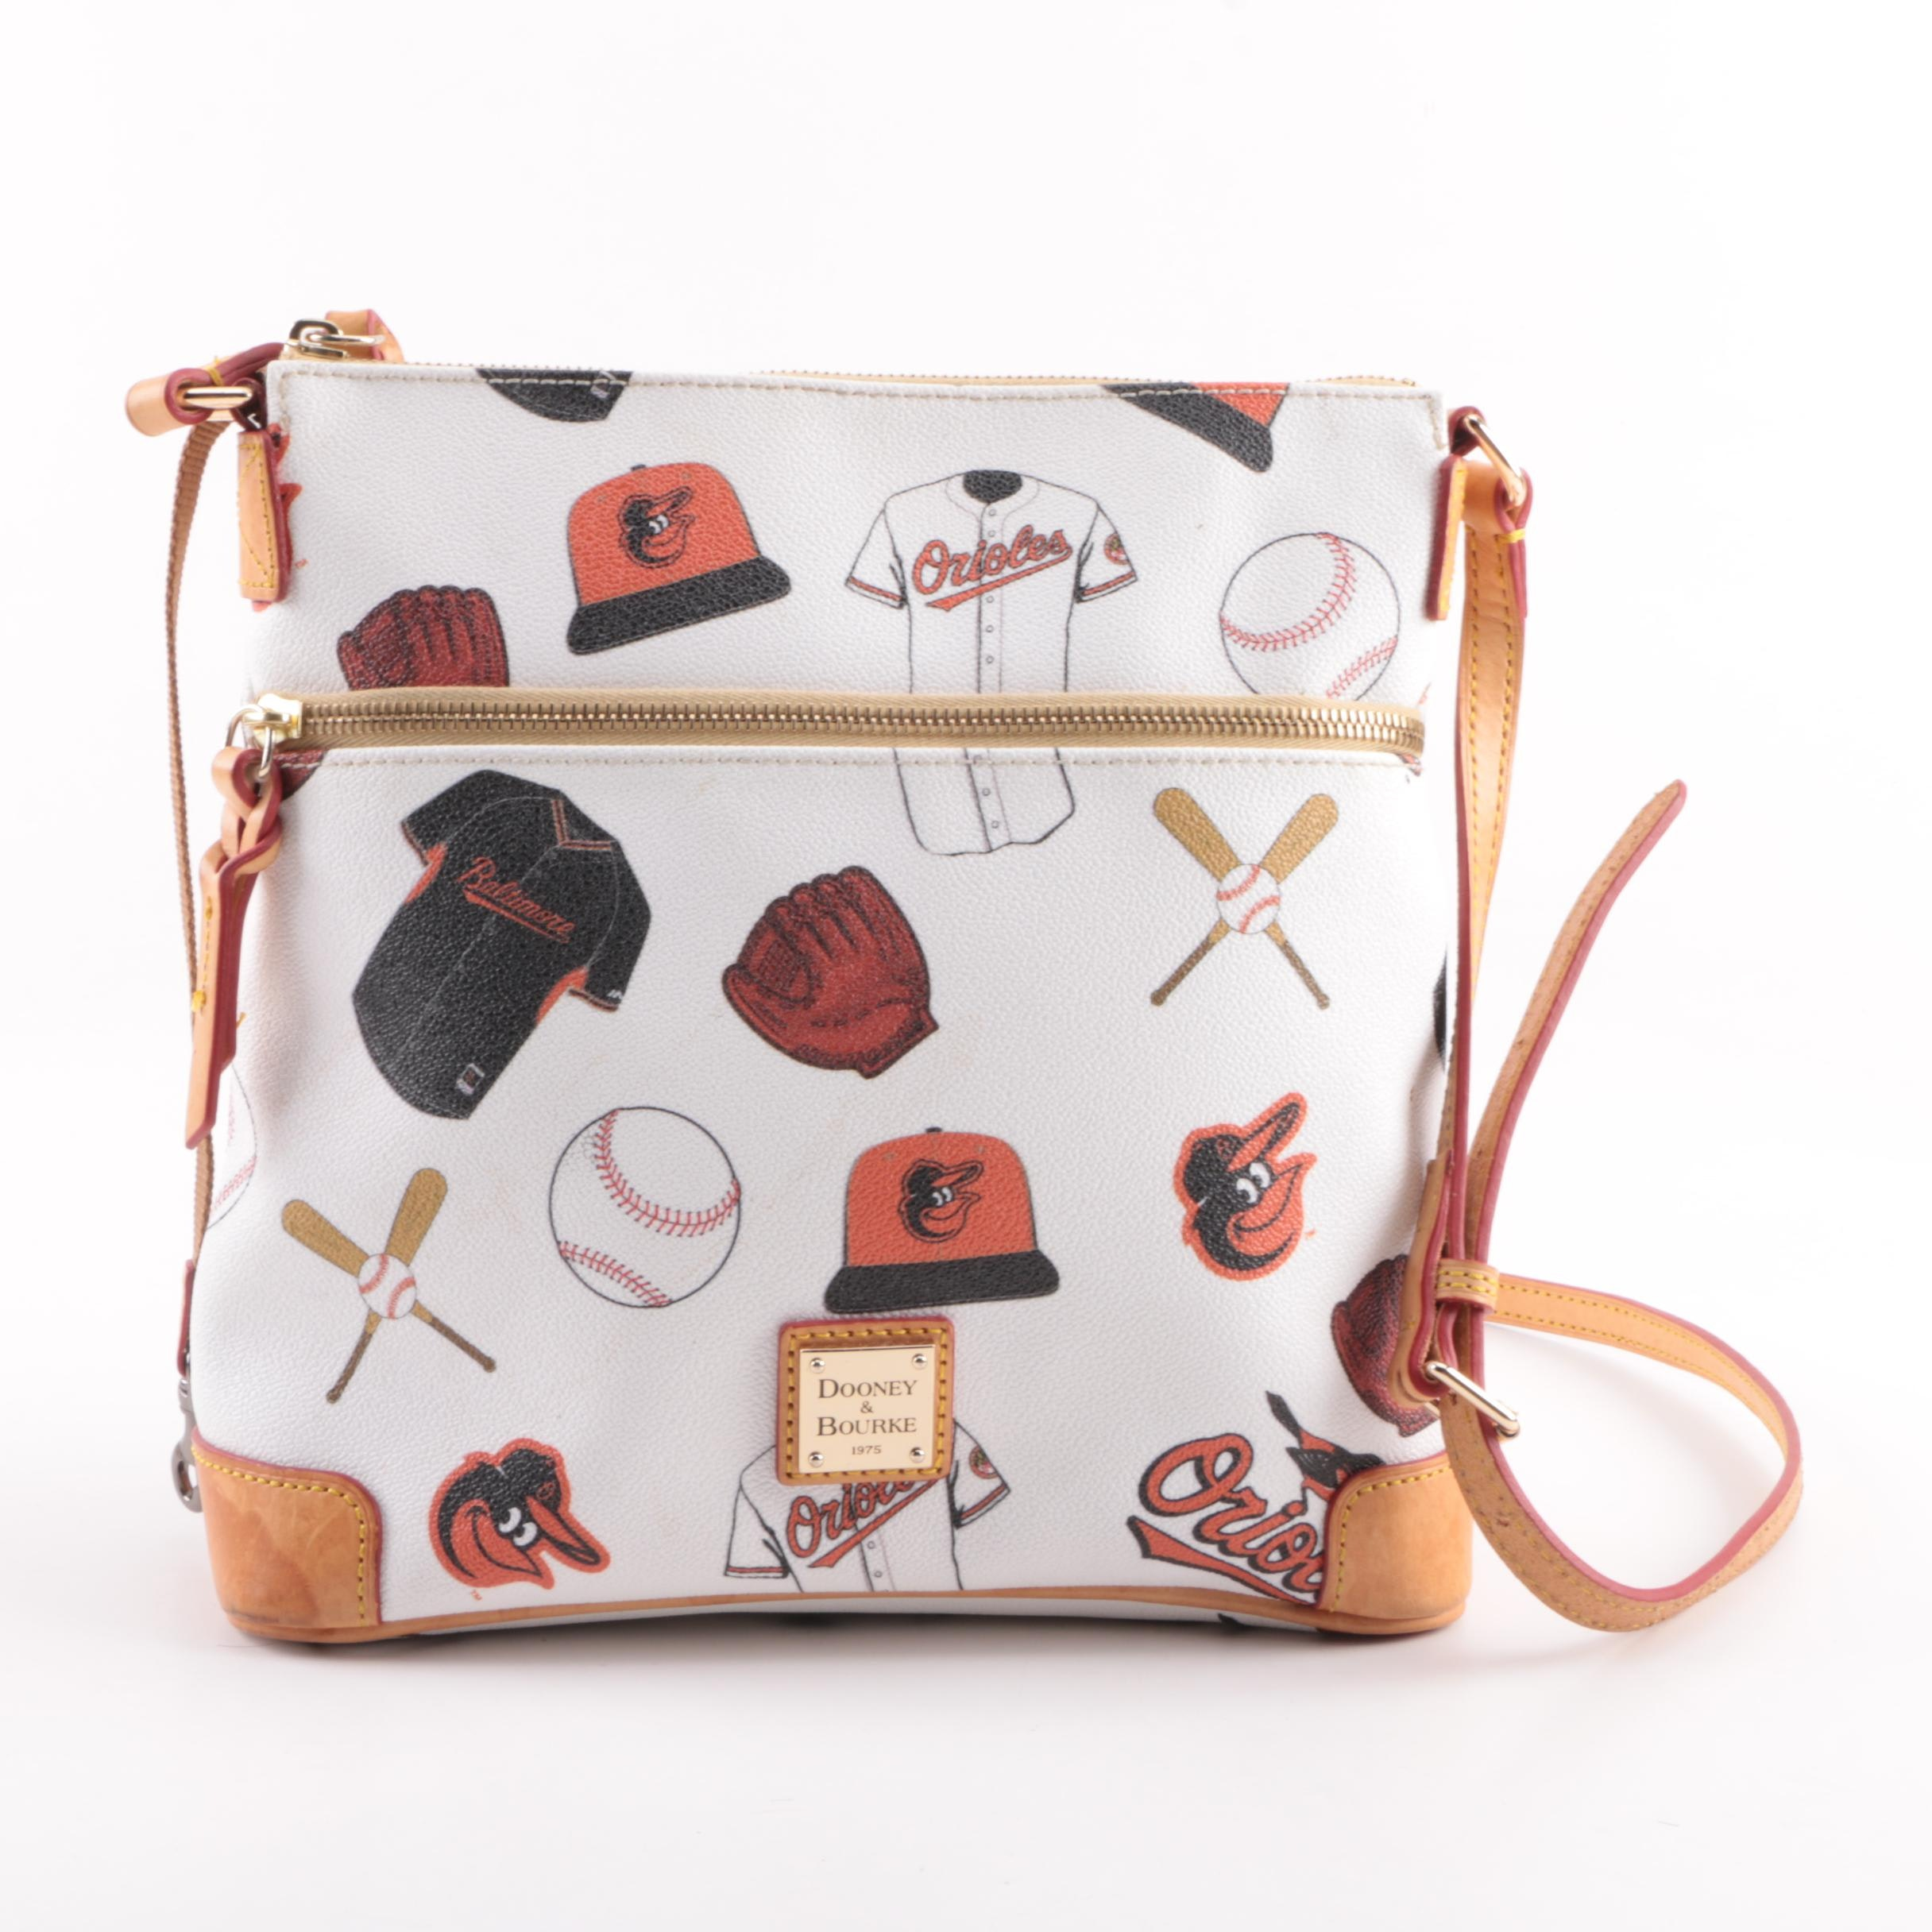 Dooney & Bourke Baltimore Orioles Coated Canvas Crossbody Bag